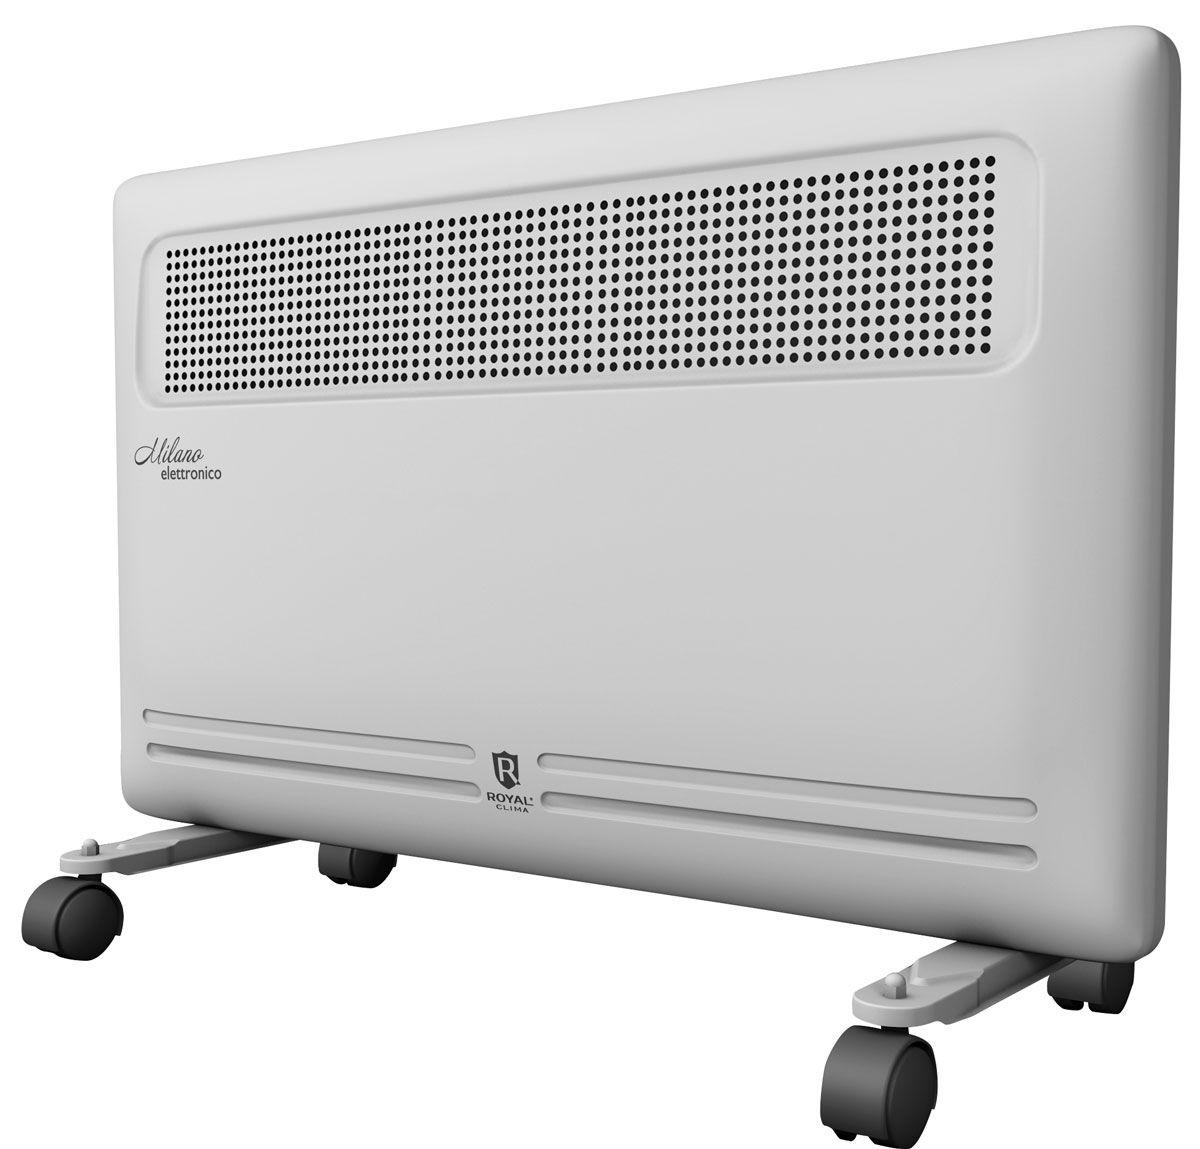 Royal Clima REC-M1500E электрический конвектор royal clima rec m1500e электрический конвектор